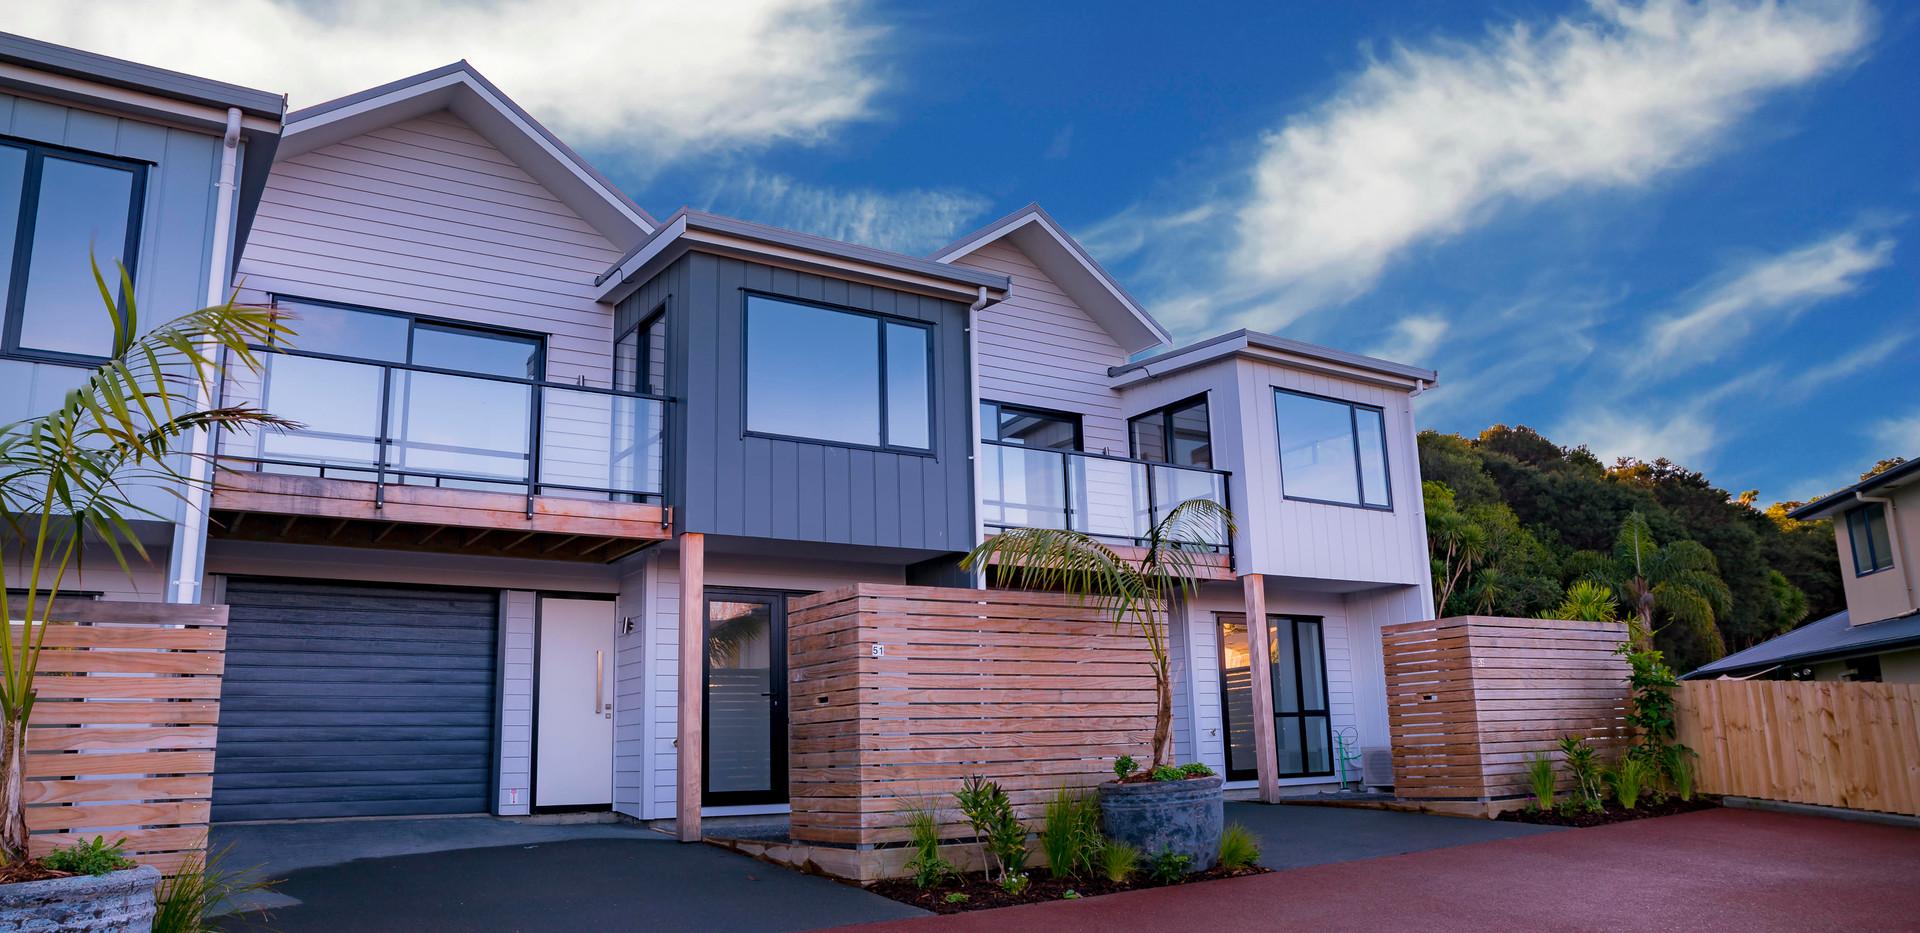 New Villas Exterior Waiheke Retirement Village